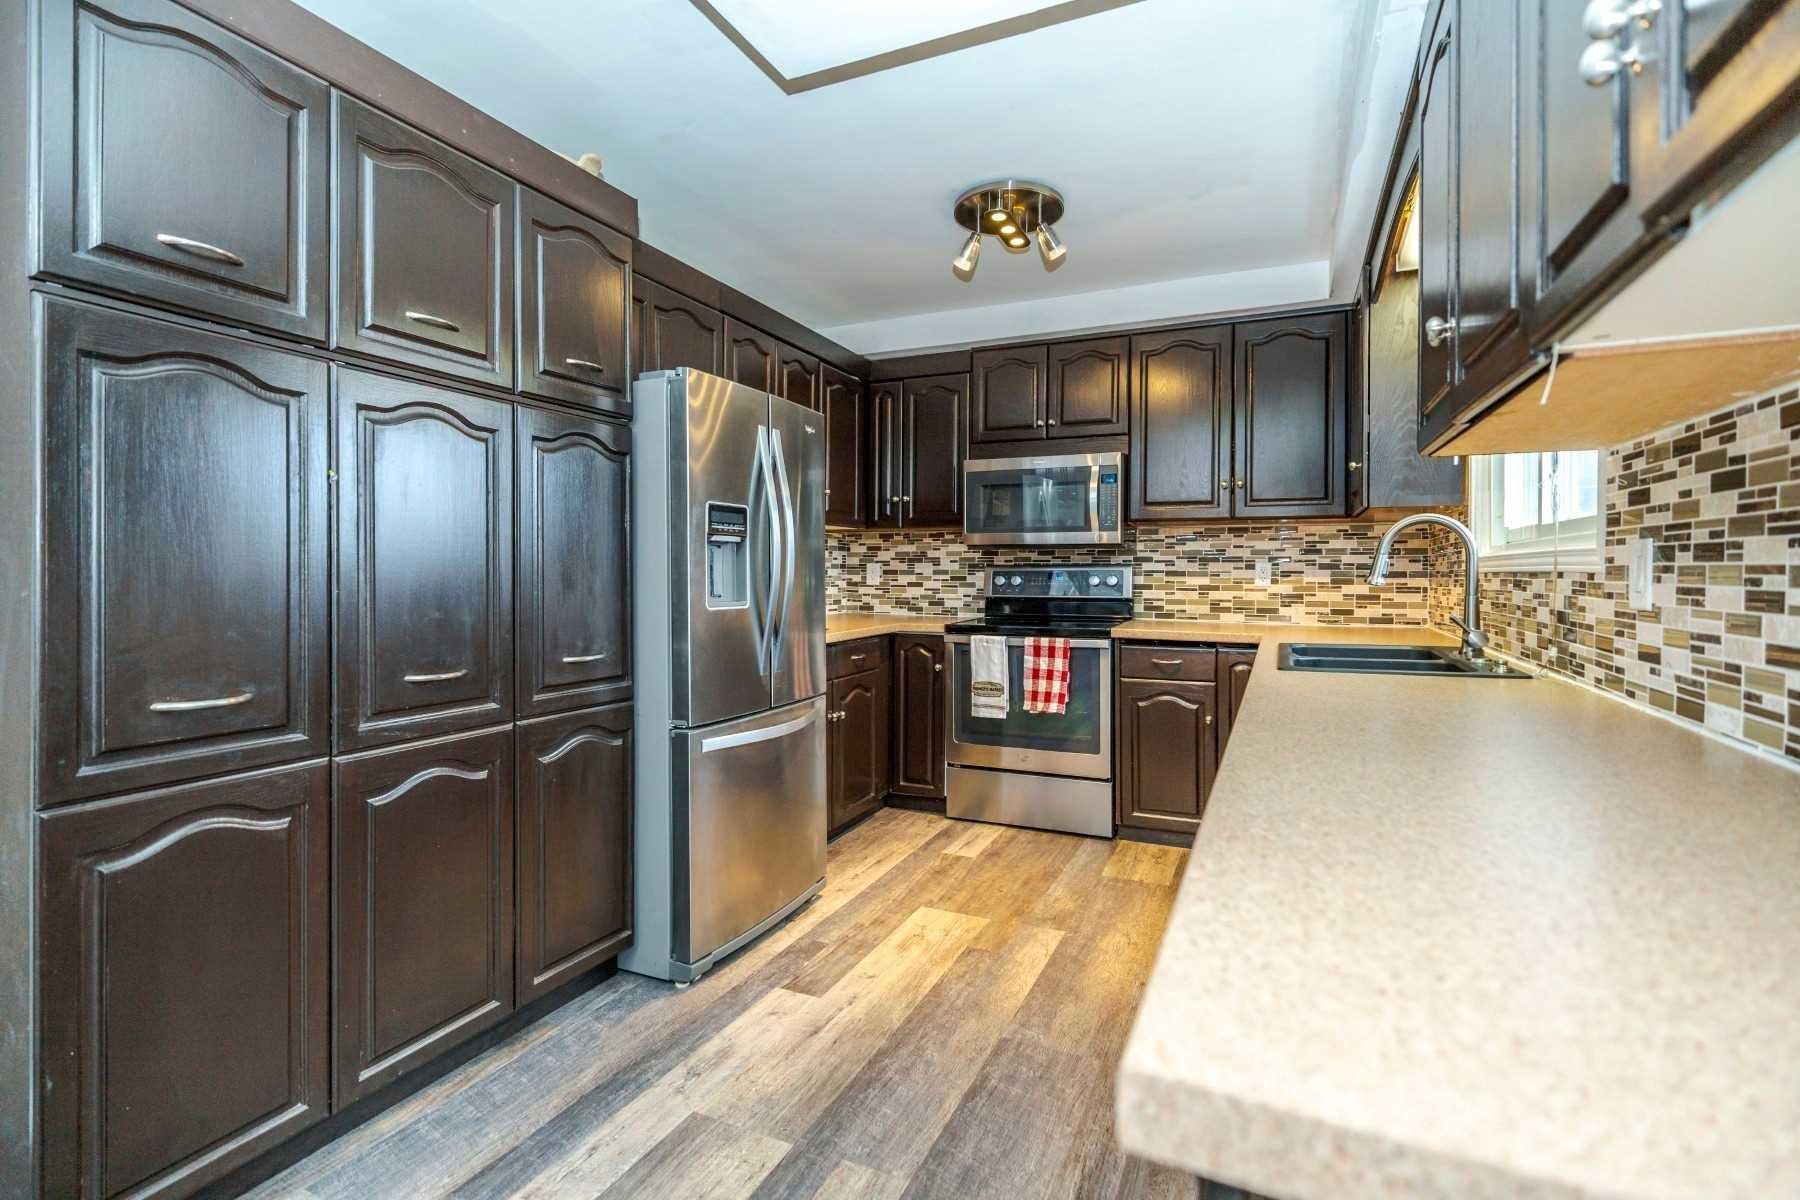 Photo 5: Photos: 190 N Church Street in Clarington: Orono House (Sidesplit 4) for sale : MLS®# E4463047